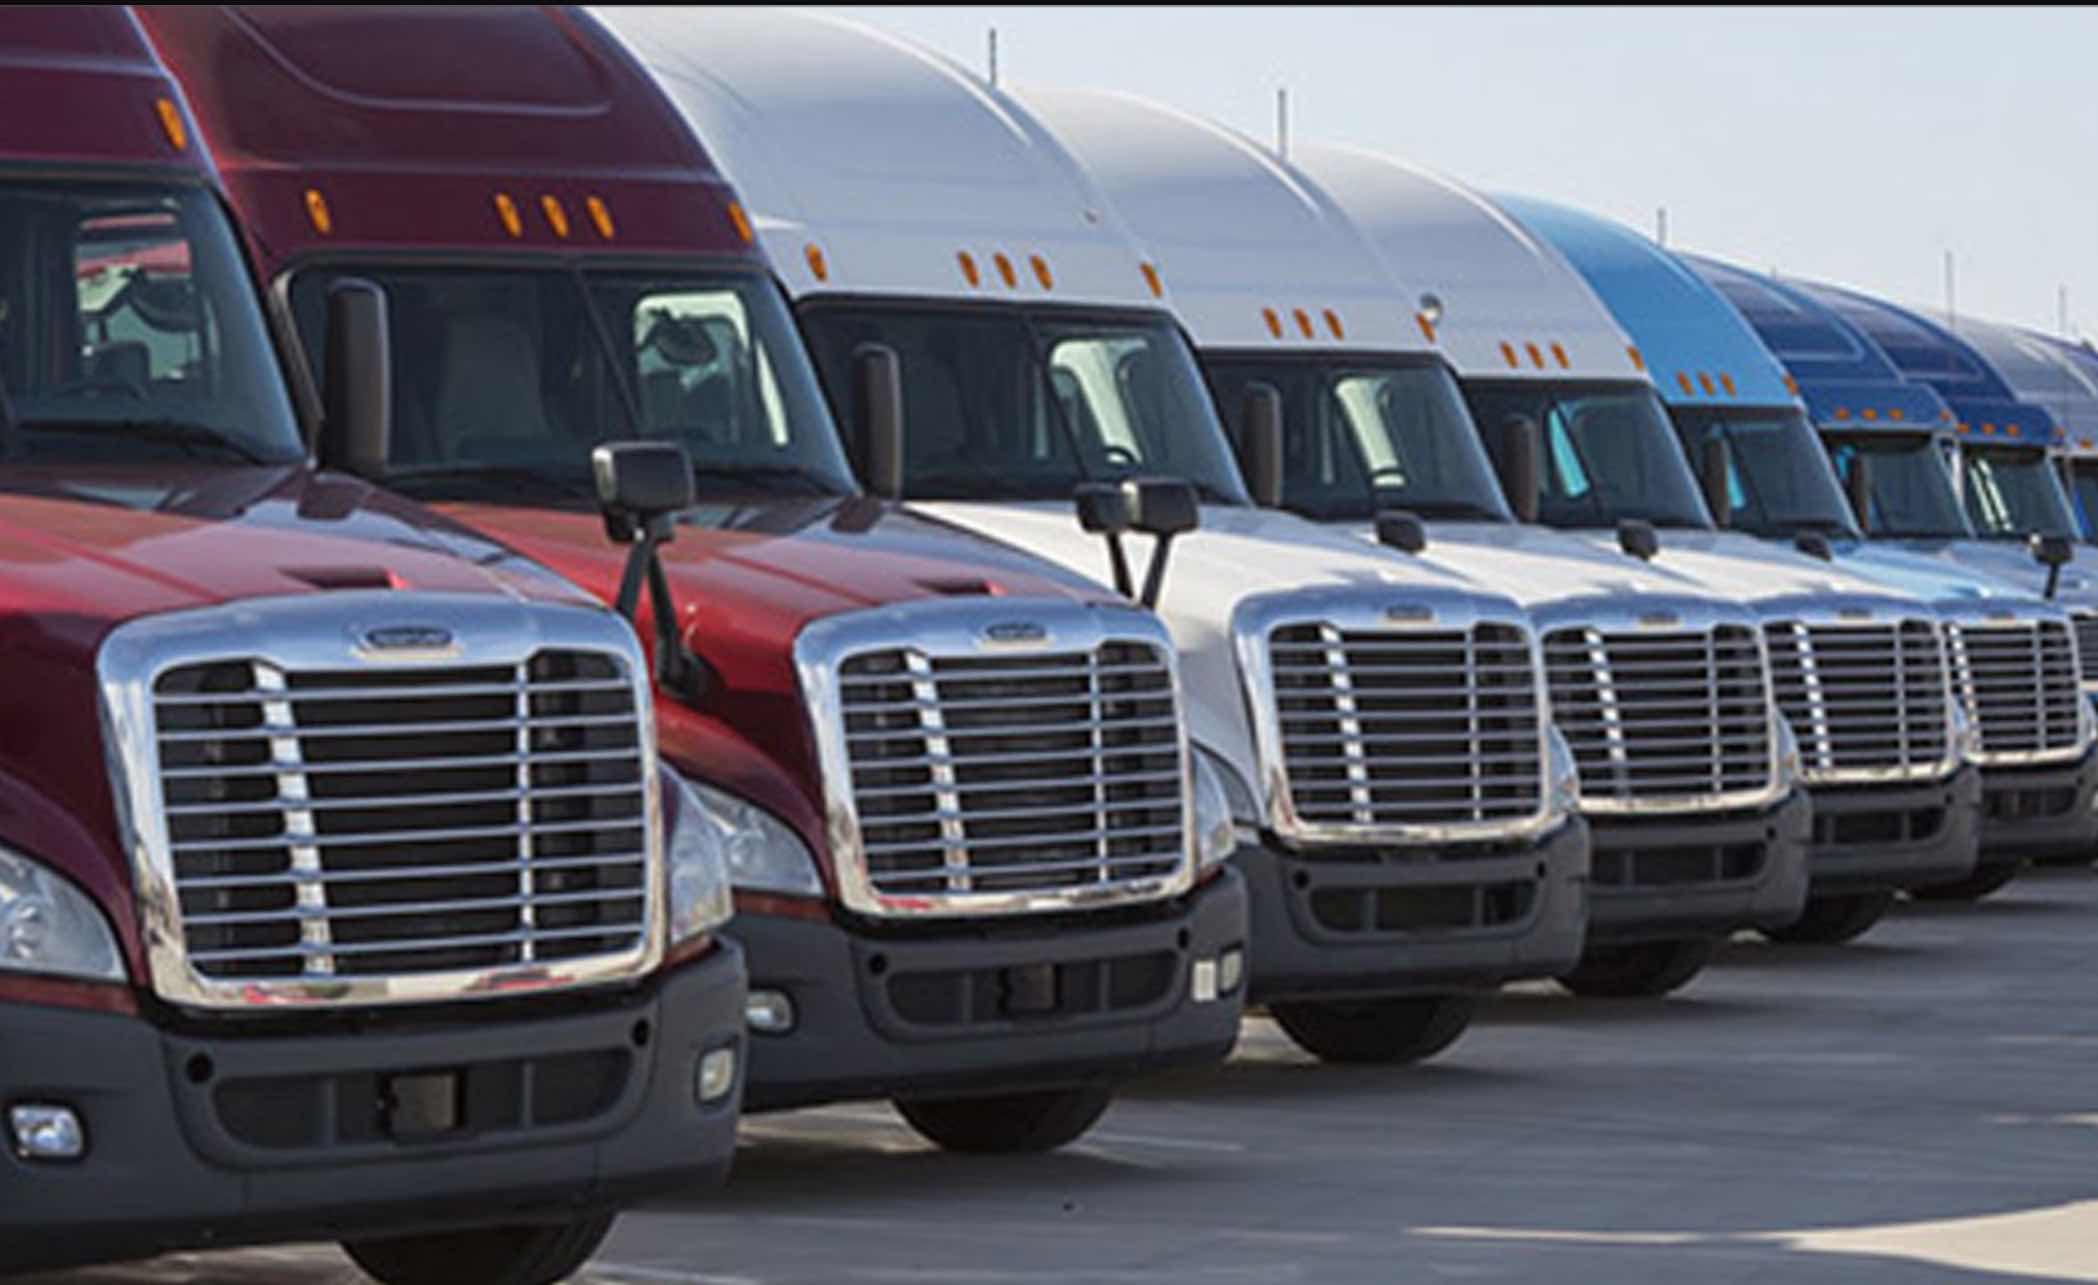 Choosing a Dedicated Fleet Provider